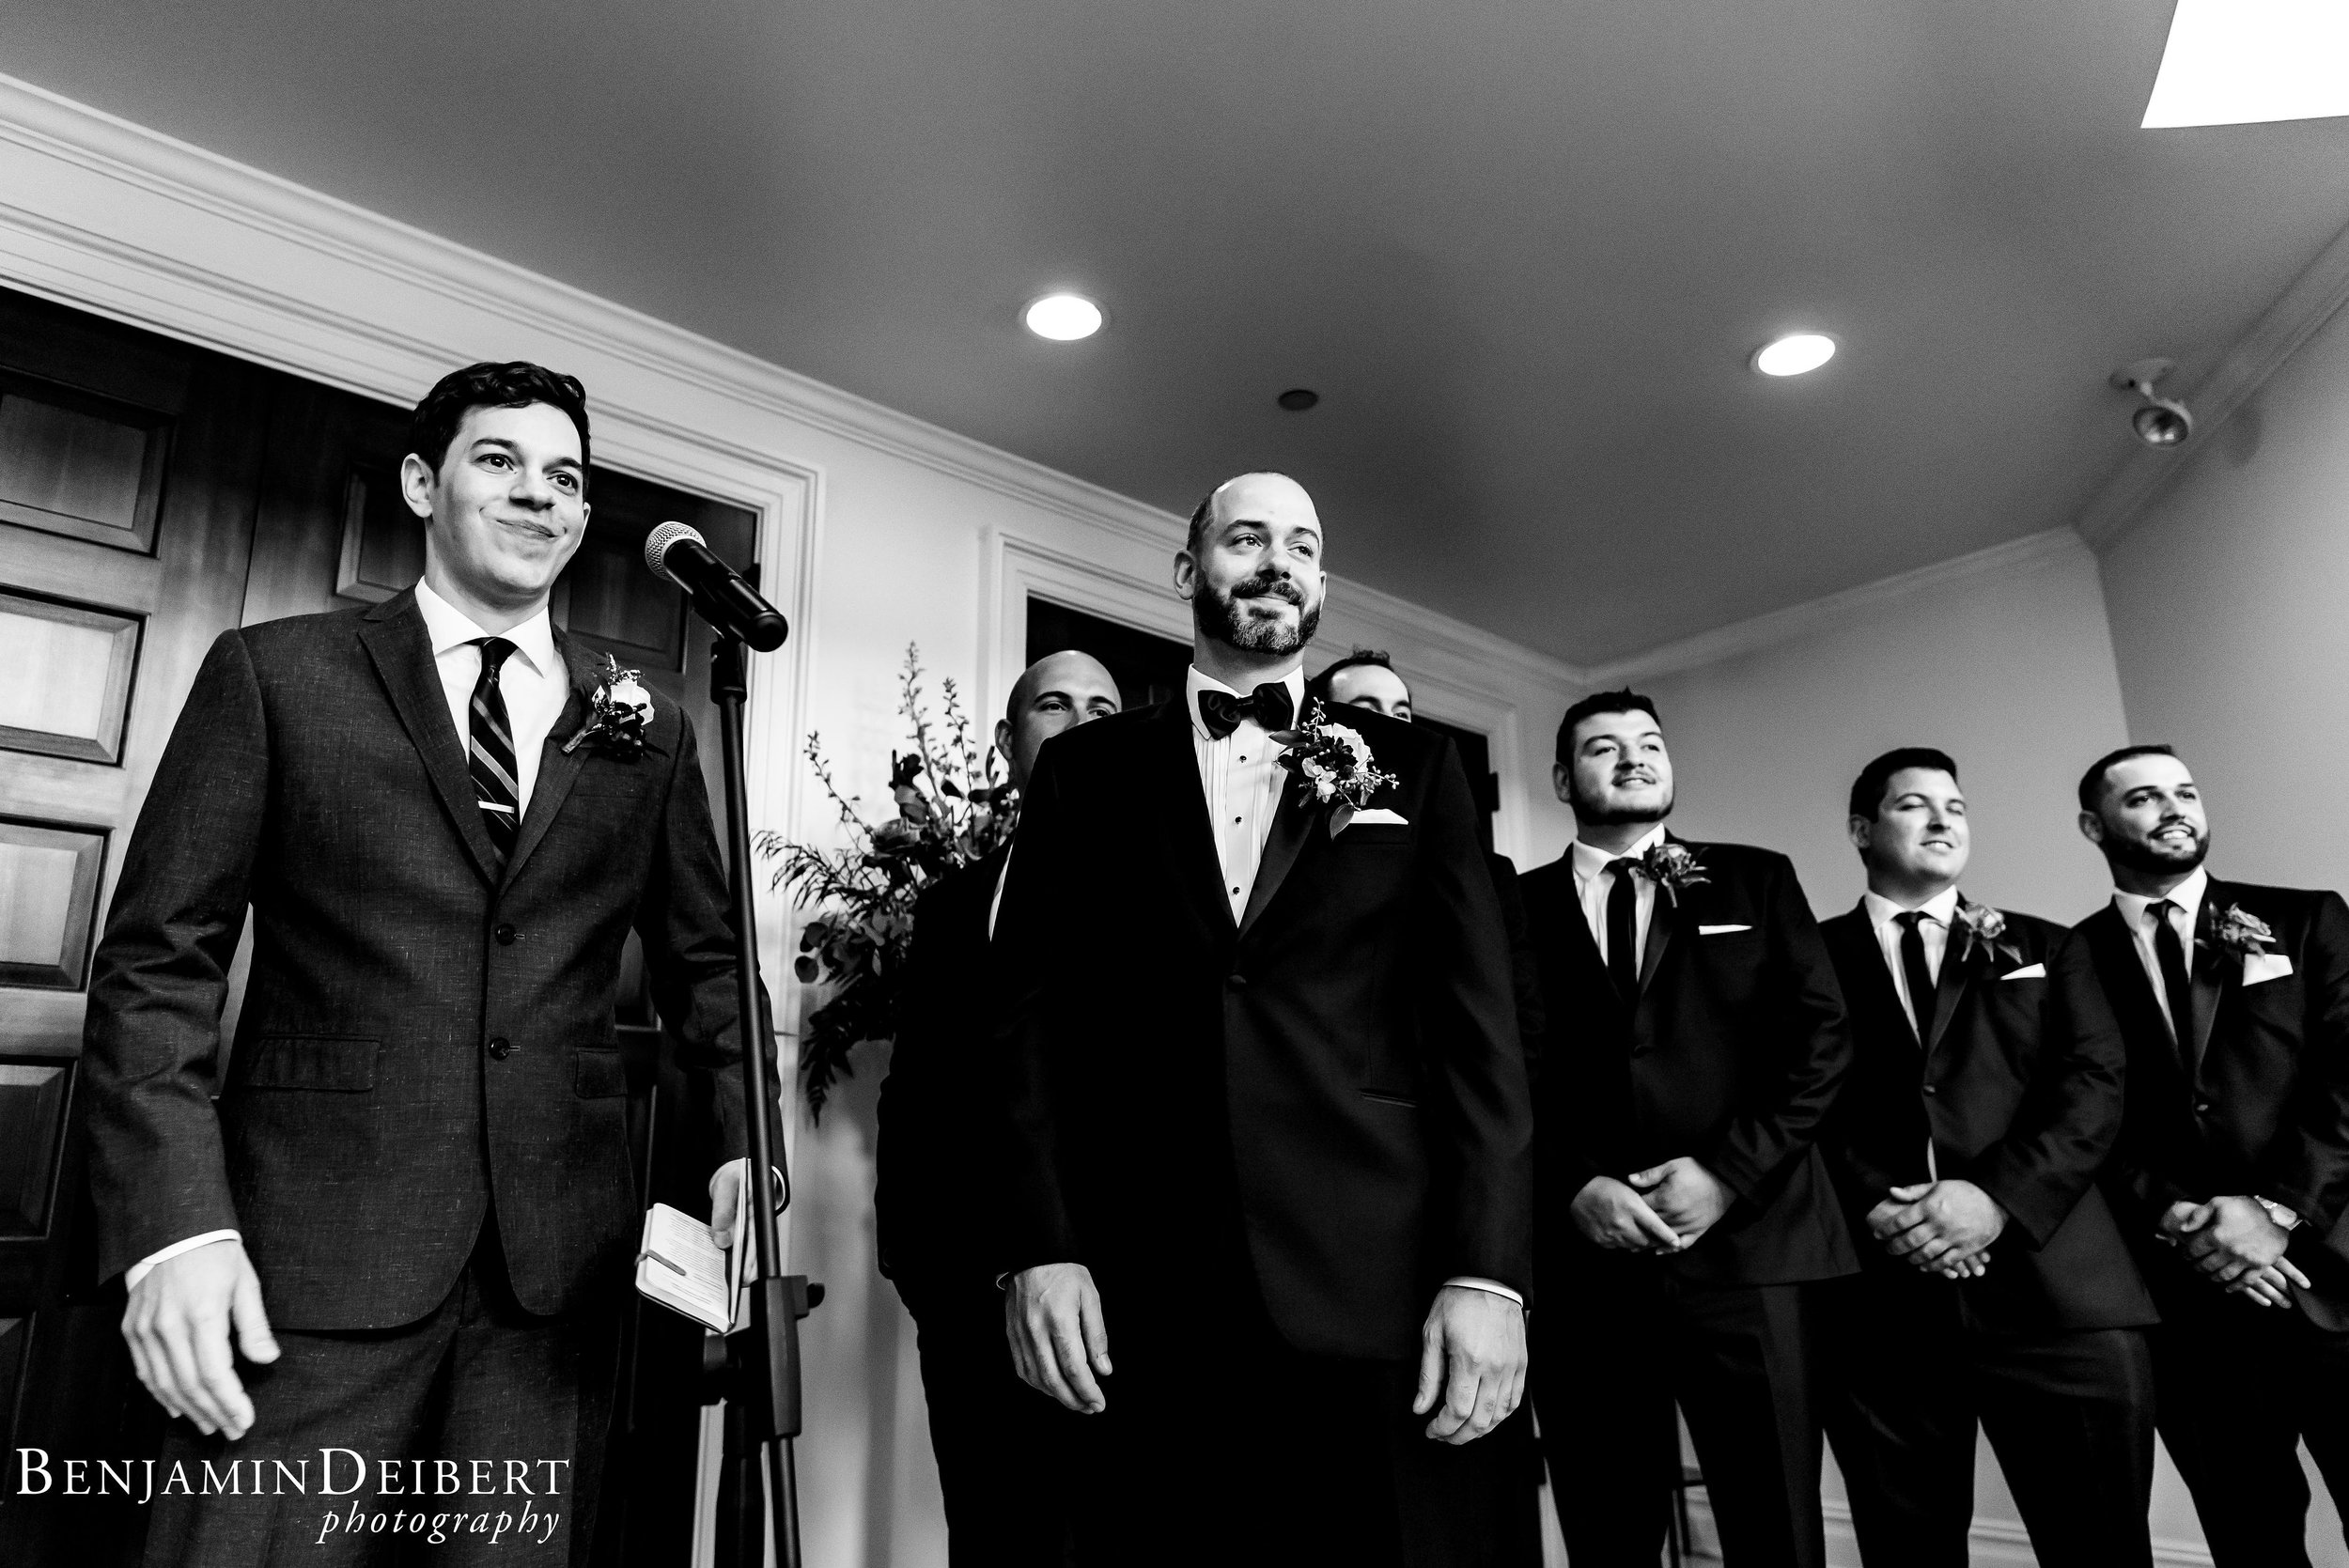 AmandaandElliott_TheCarriageHouse_Wedding-33.jpg